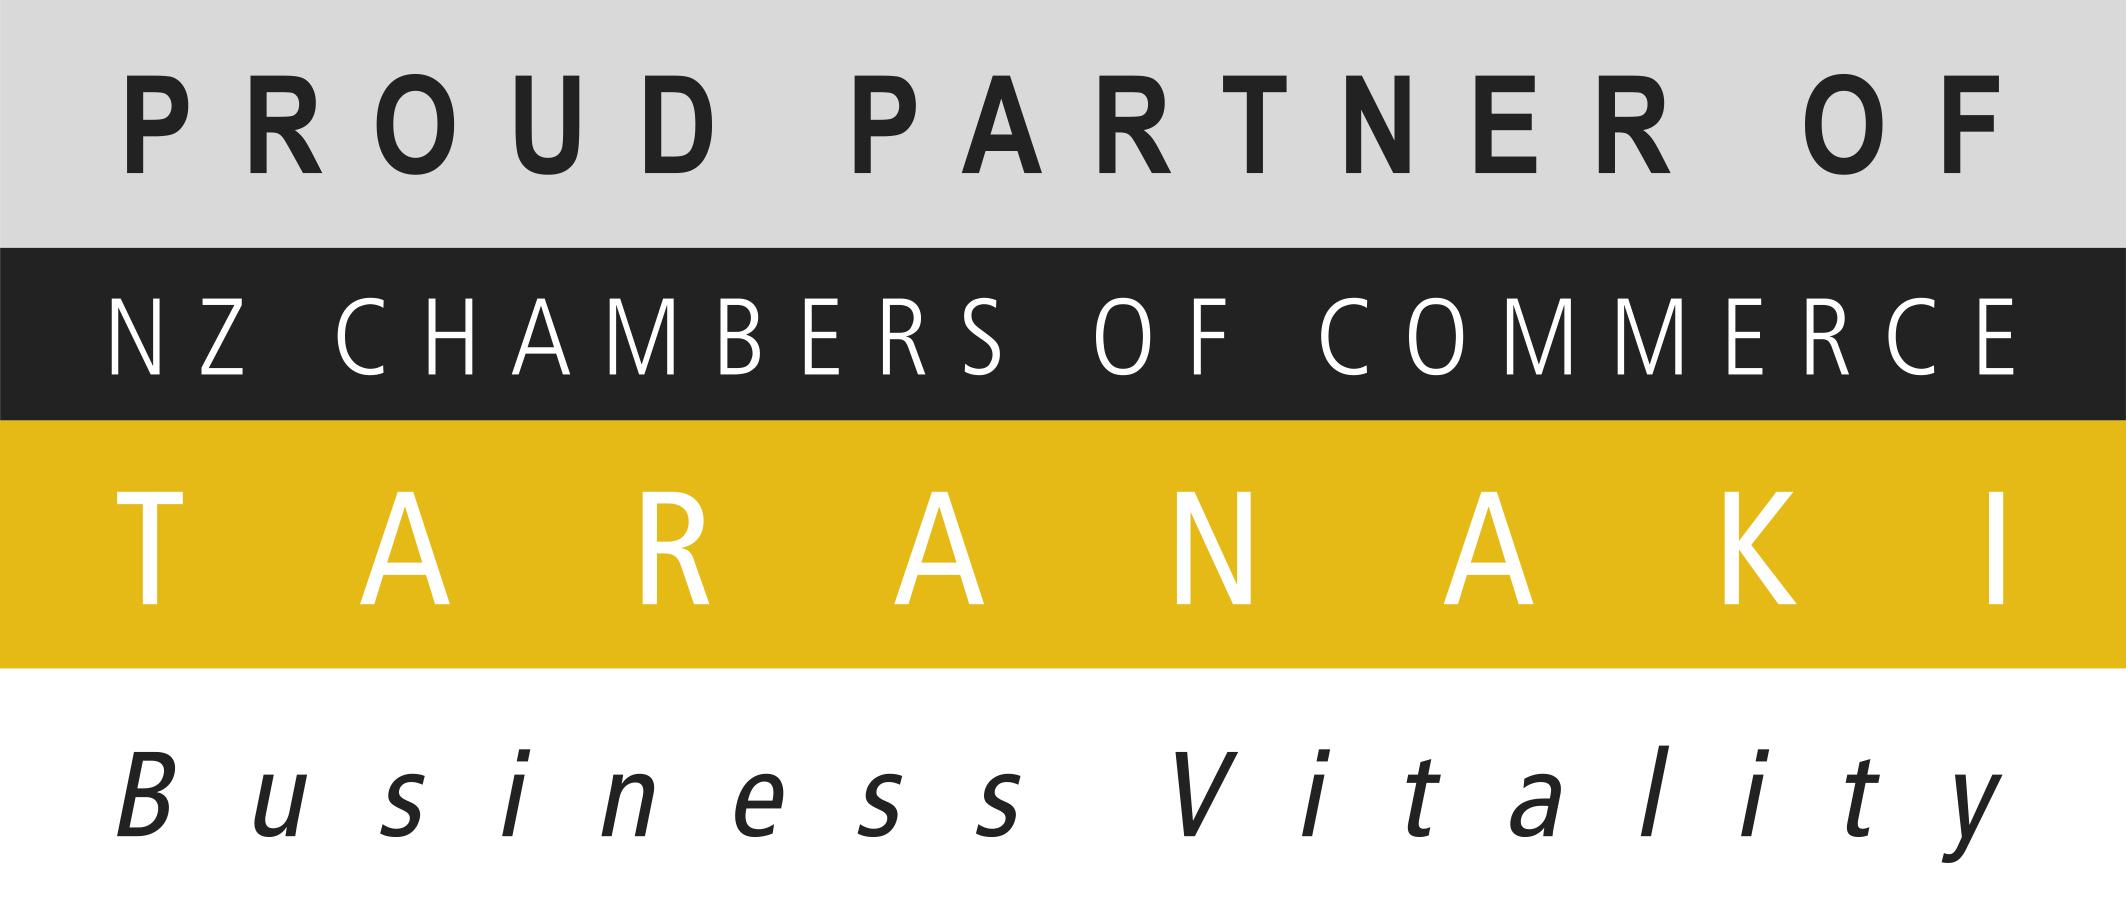 NZ Chambers of Commerce